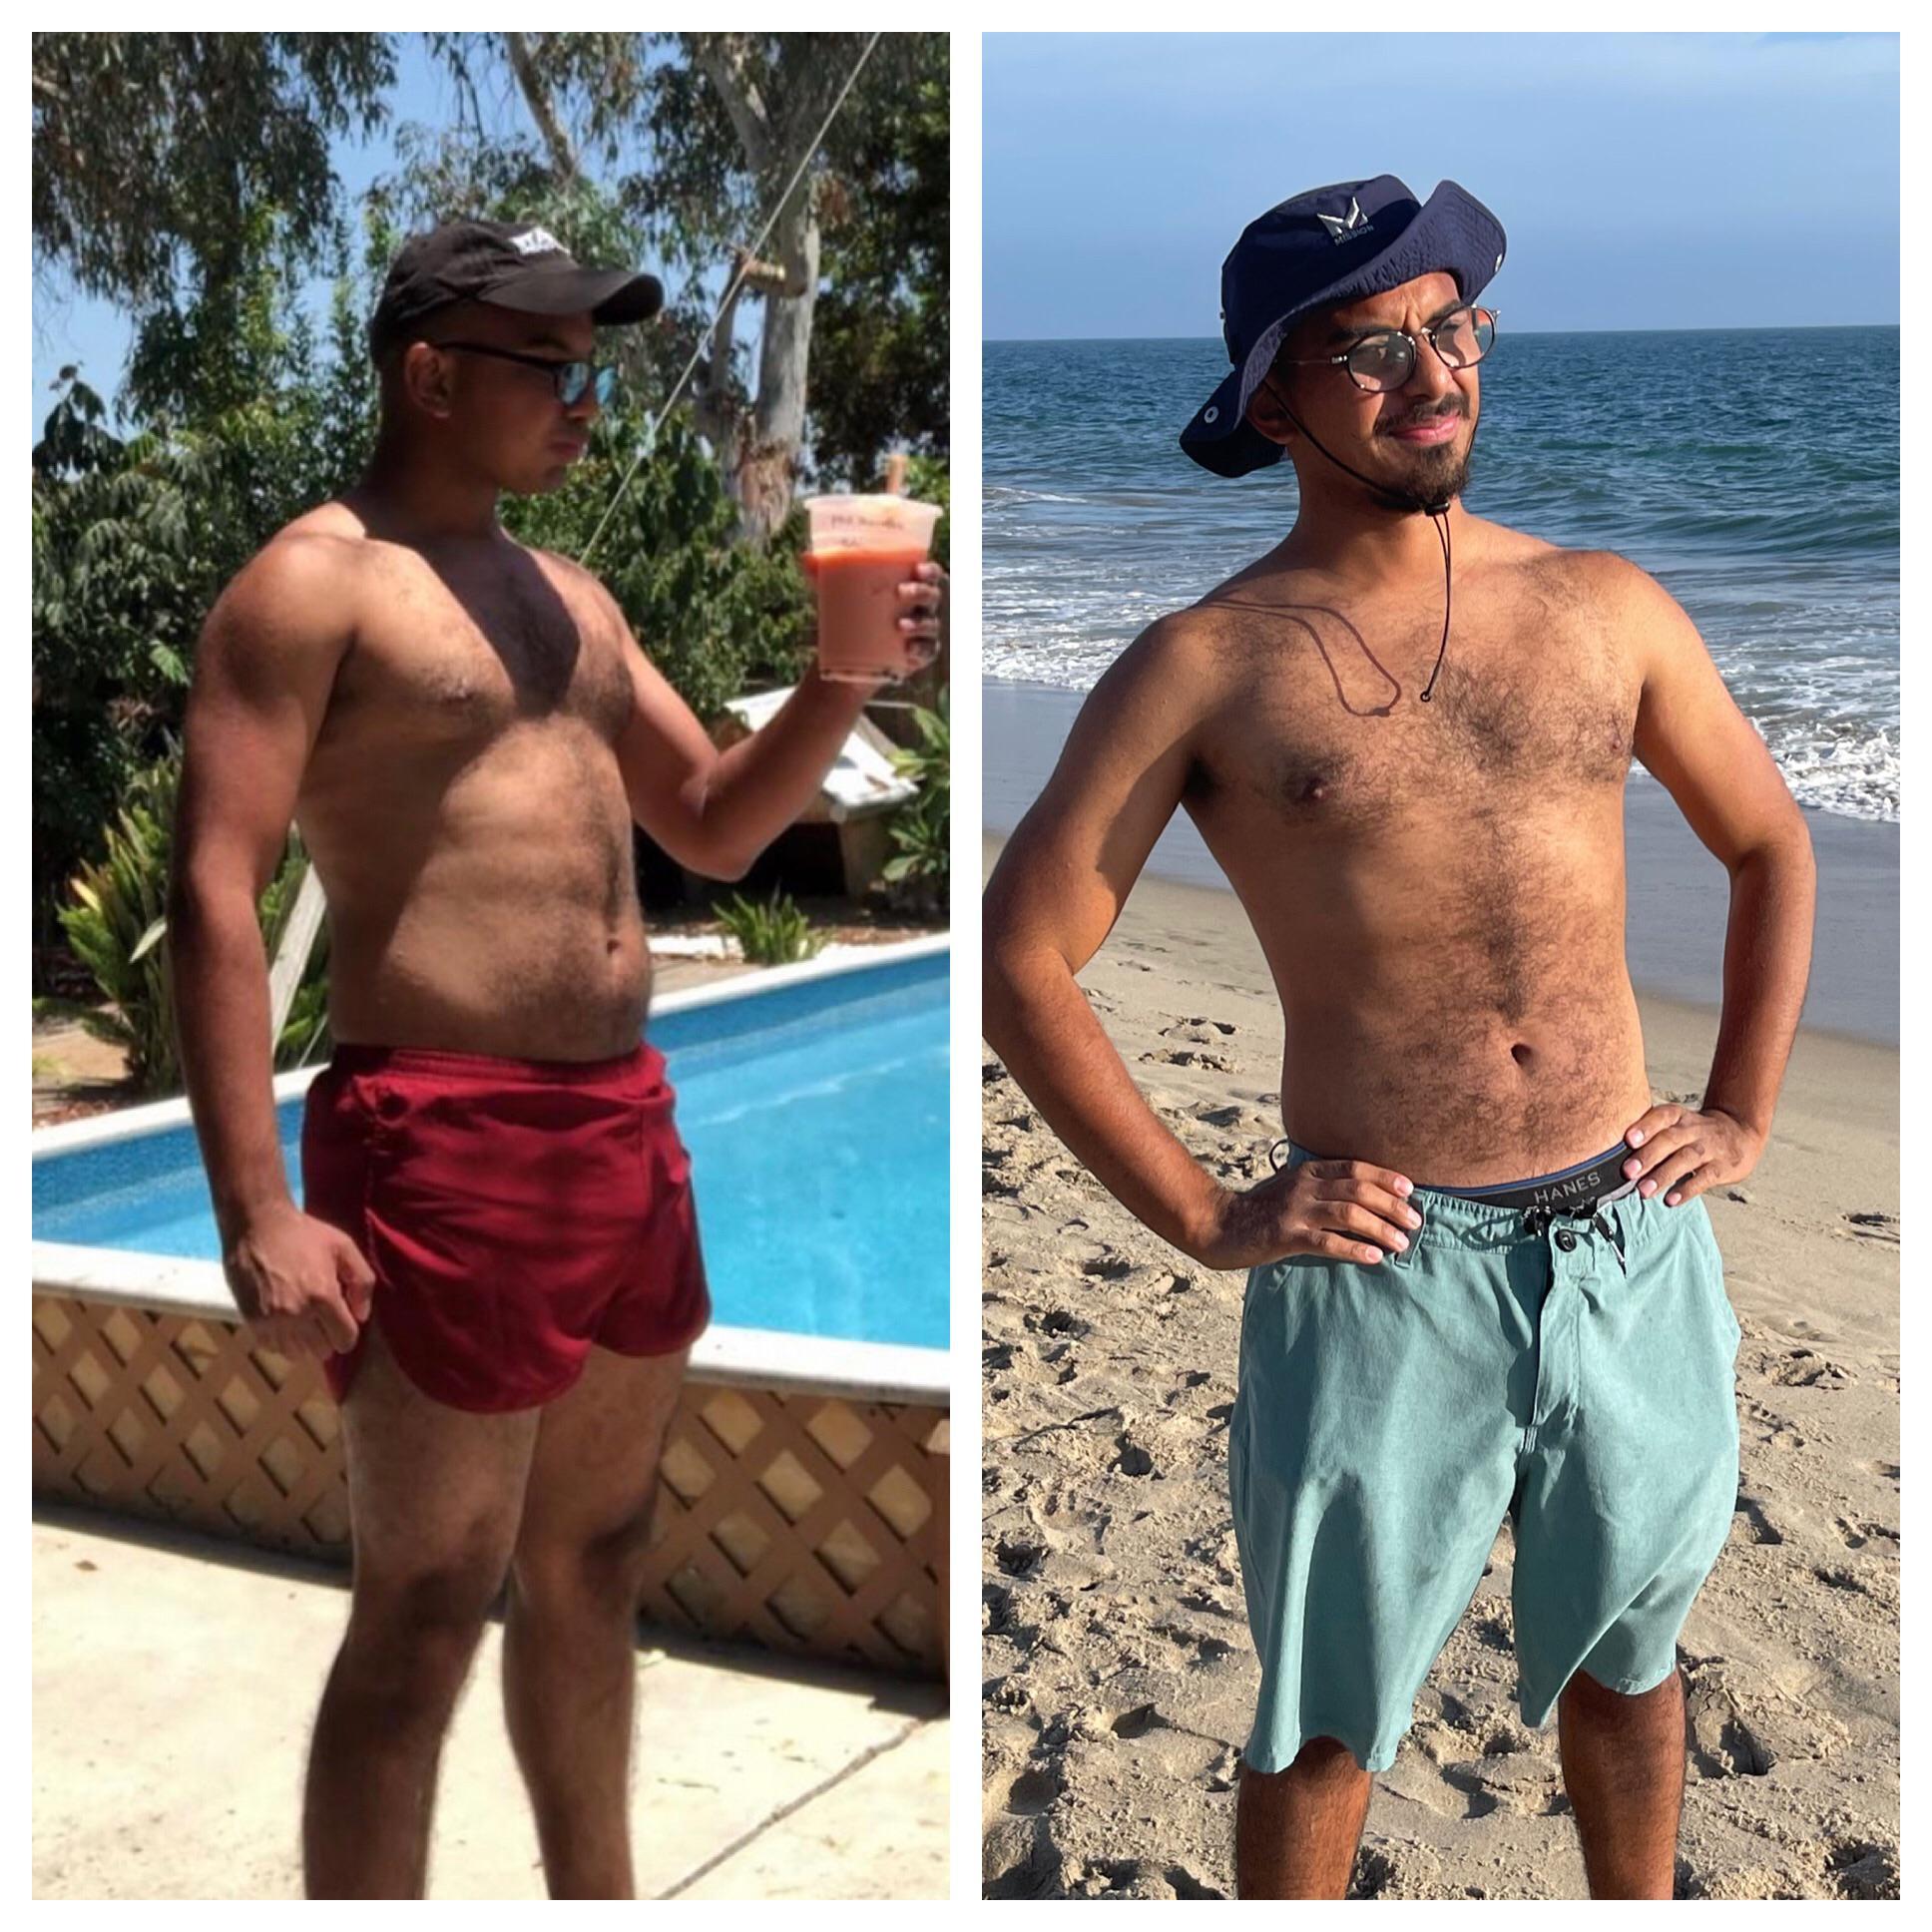 Progress Pics of 23 lbs Weight Loss 5 foot 8 Male 185 lbs to 162 lbs